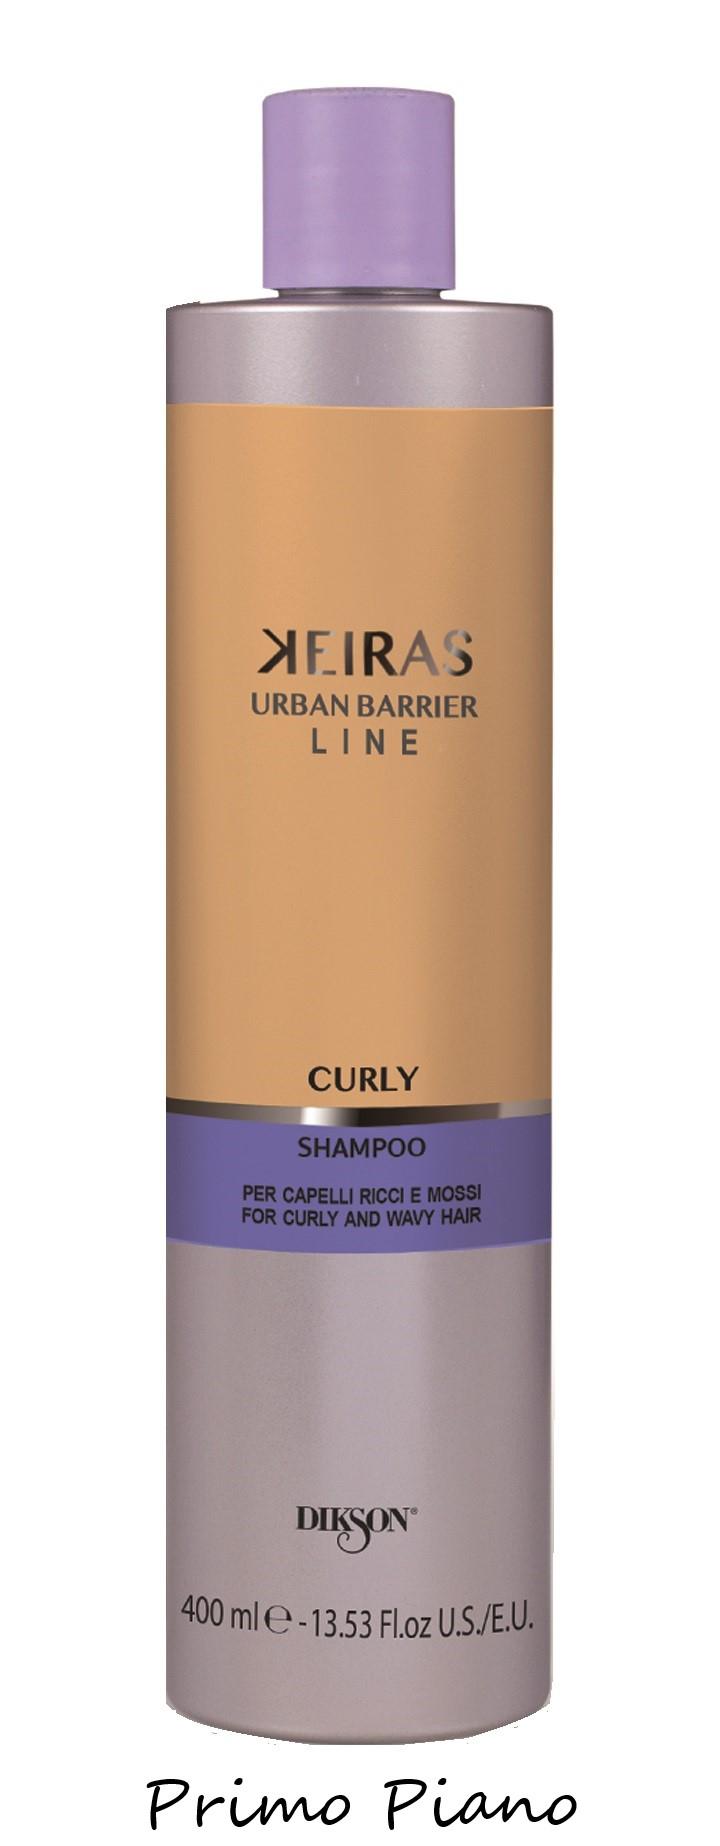 Keiras Urban Barrier Line Shampoo Curly 400 ml